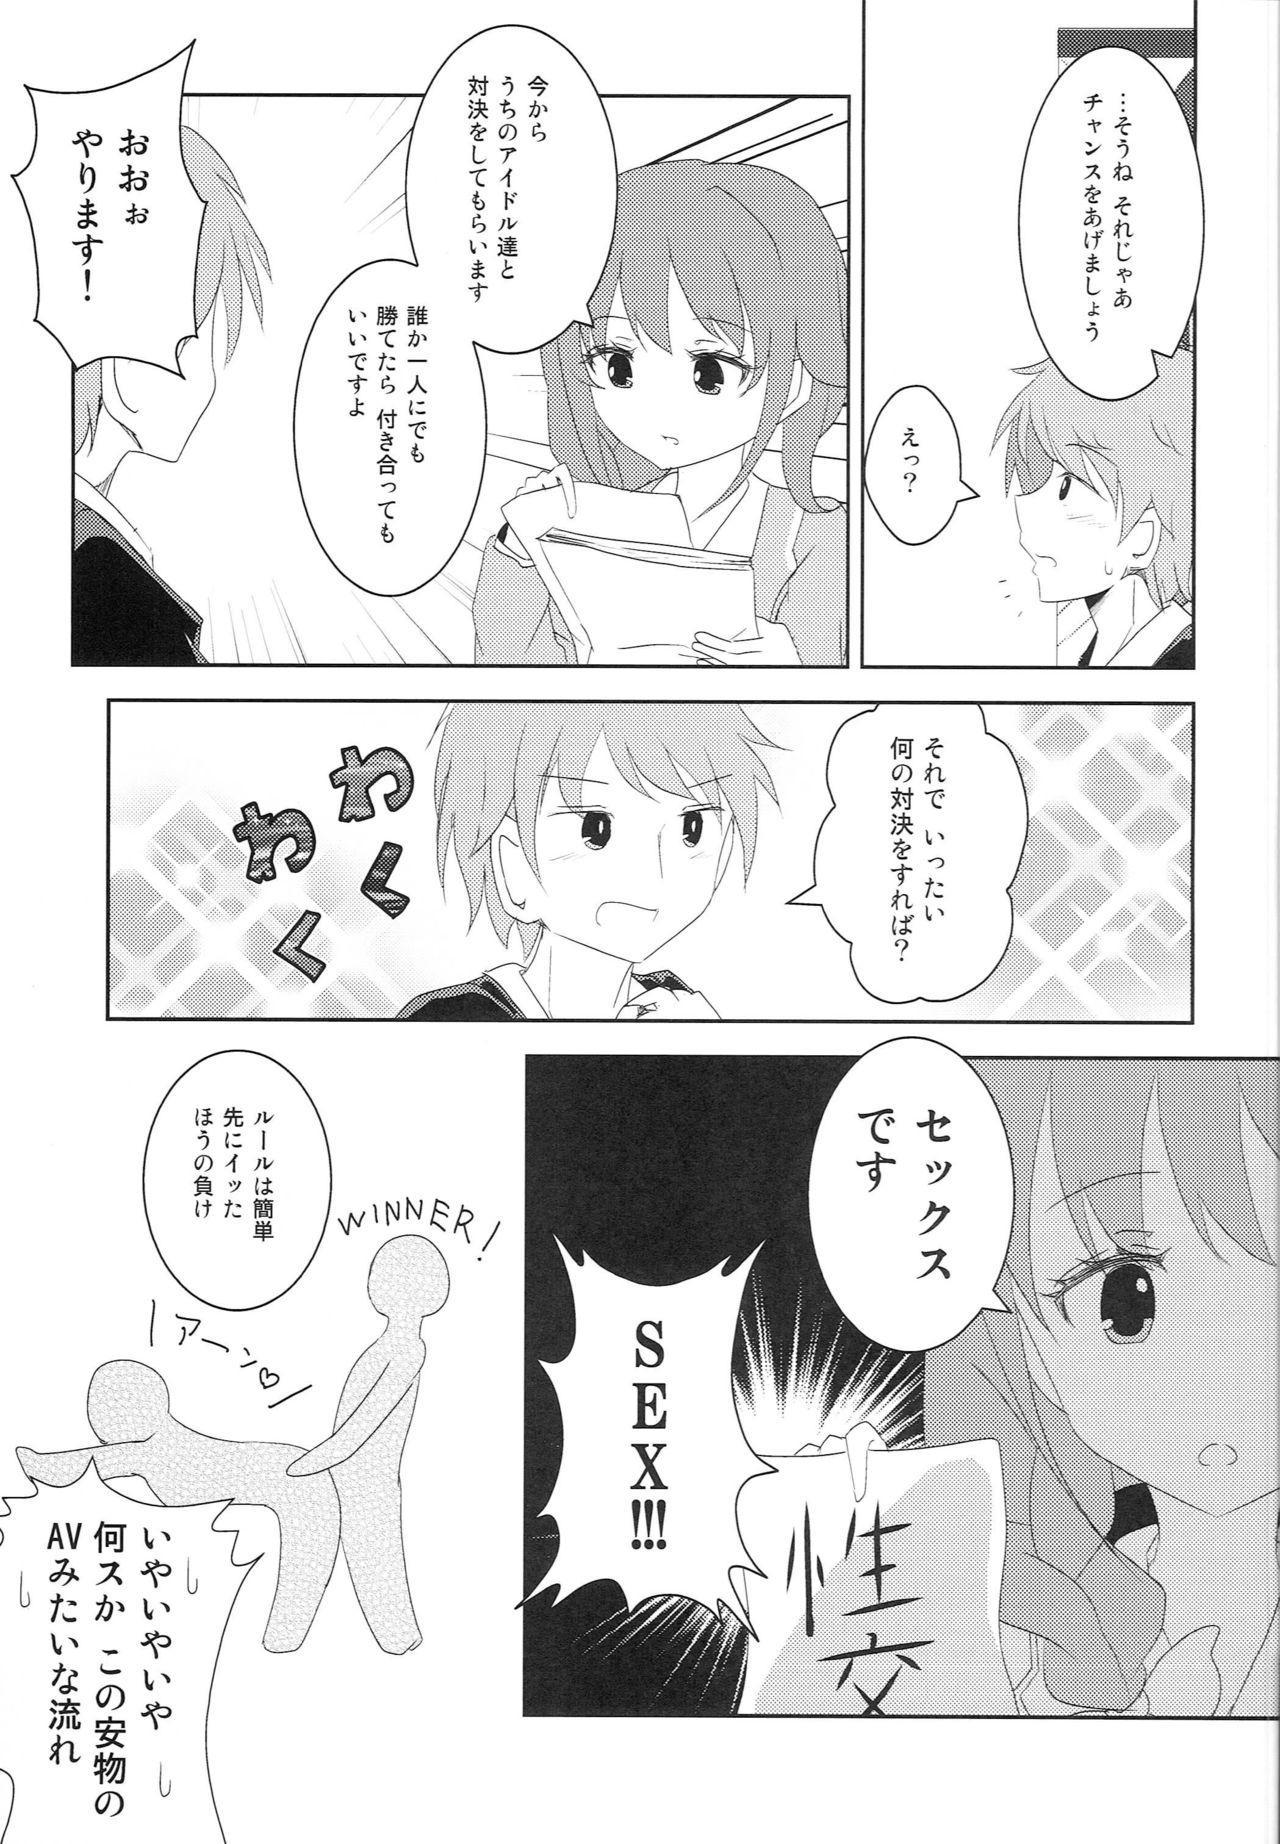 (CINDERELLA FESTIV@L) [Ribbon Enikki+ (Mickeysmith)] Chihiro-san ni Kokuhaku Shitara, Idol-tachi ni Mawasaretanda ga. (THE IDOLM@STER CINDERELLA GIRLS) 3